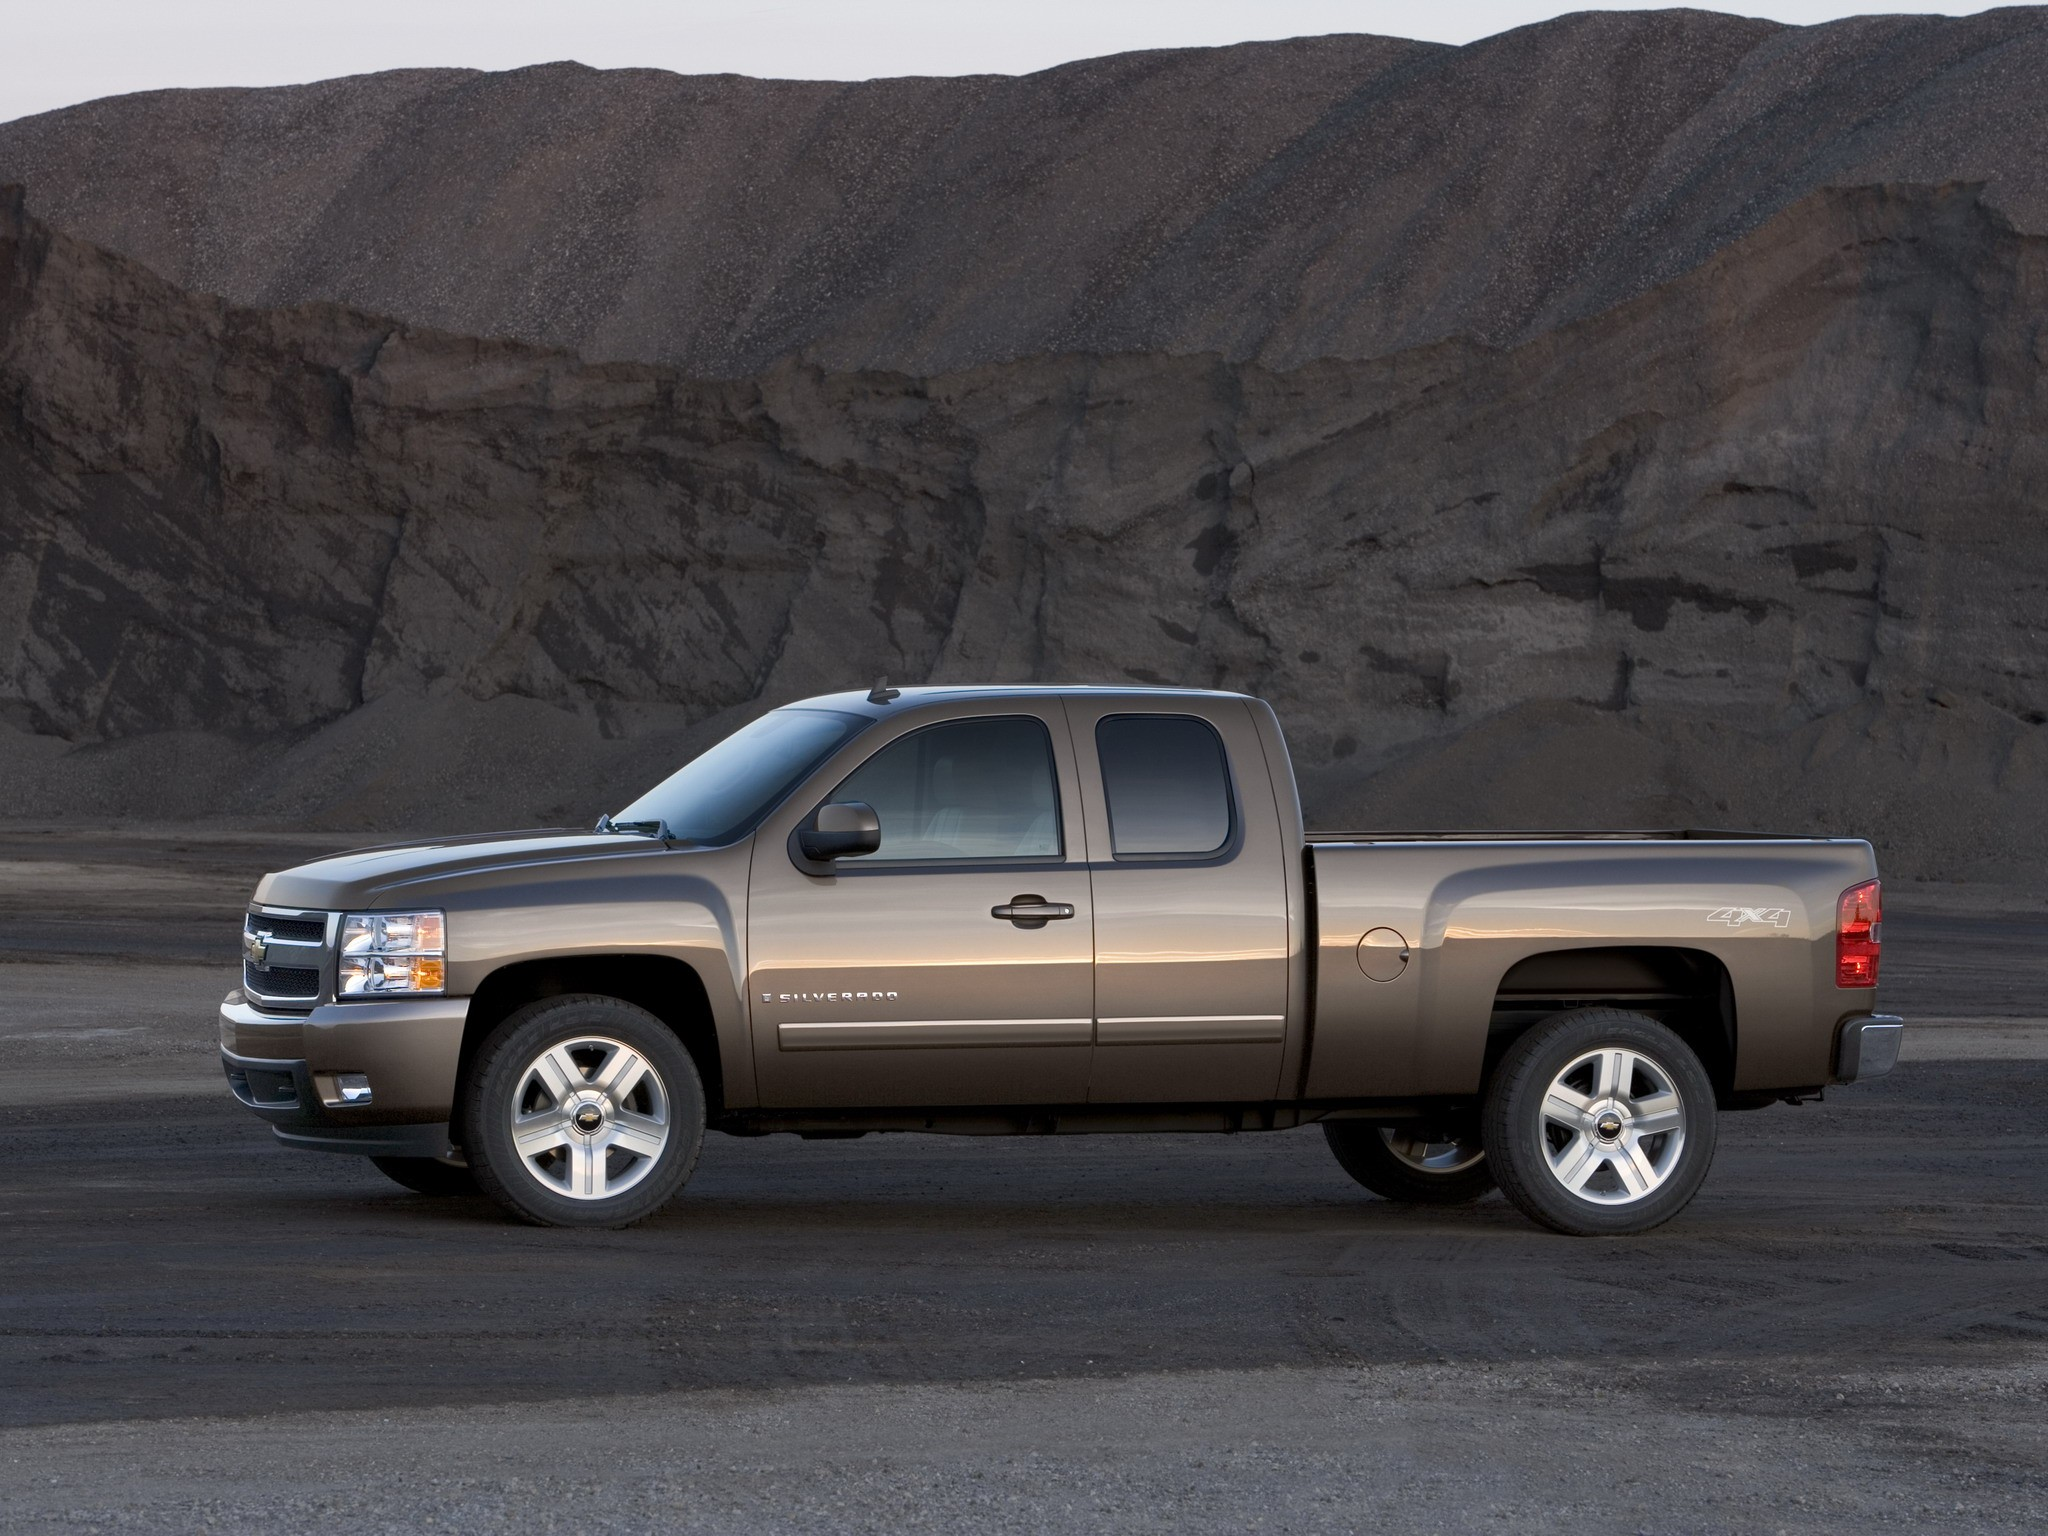 Tundra Vs Silverado >> CHEVROLET Silverado 1500 Extended Cab specs & photos - 2008, 2009, 2010, 2011, 2012 - autoevolution